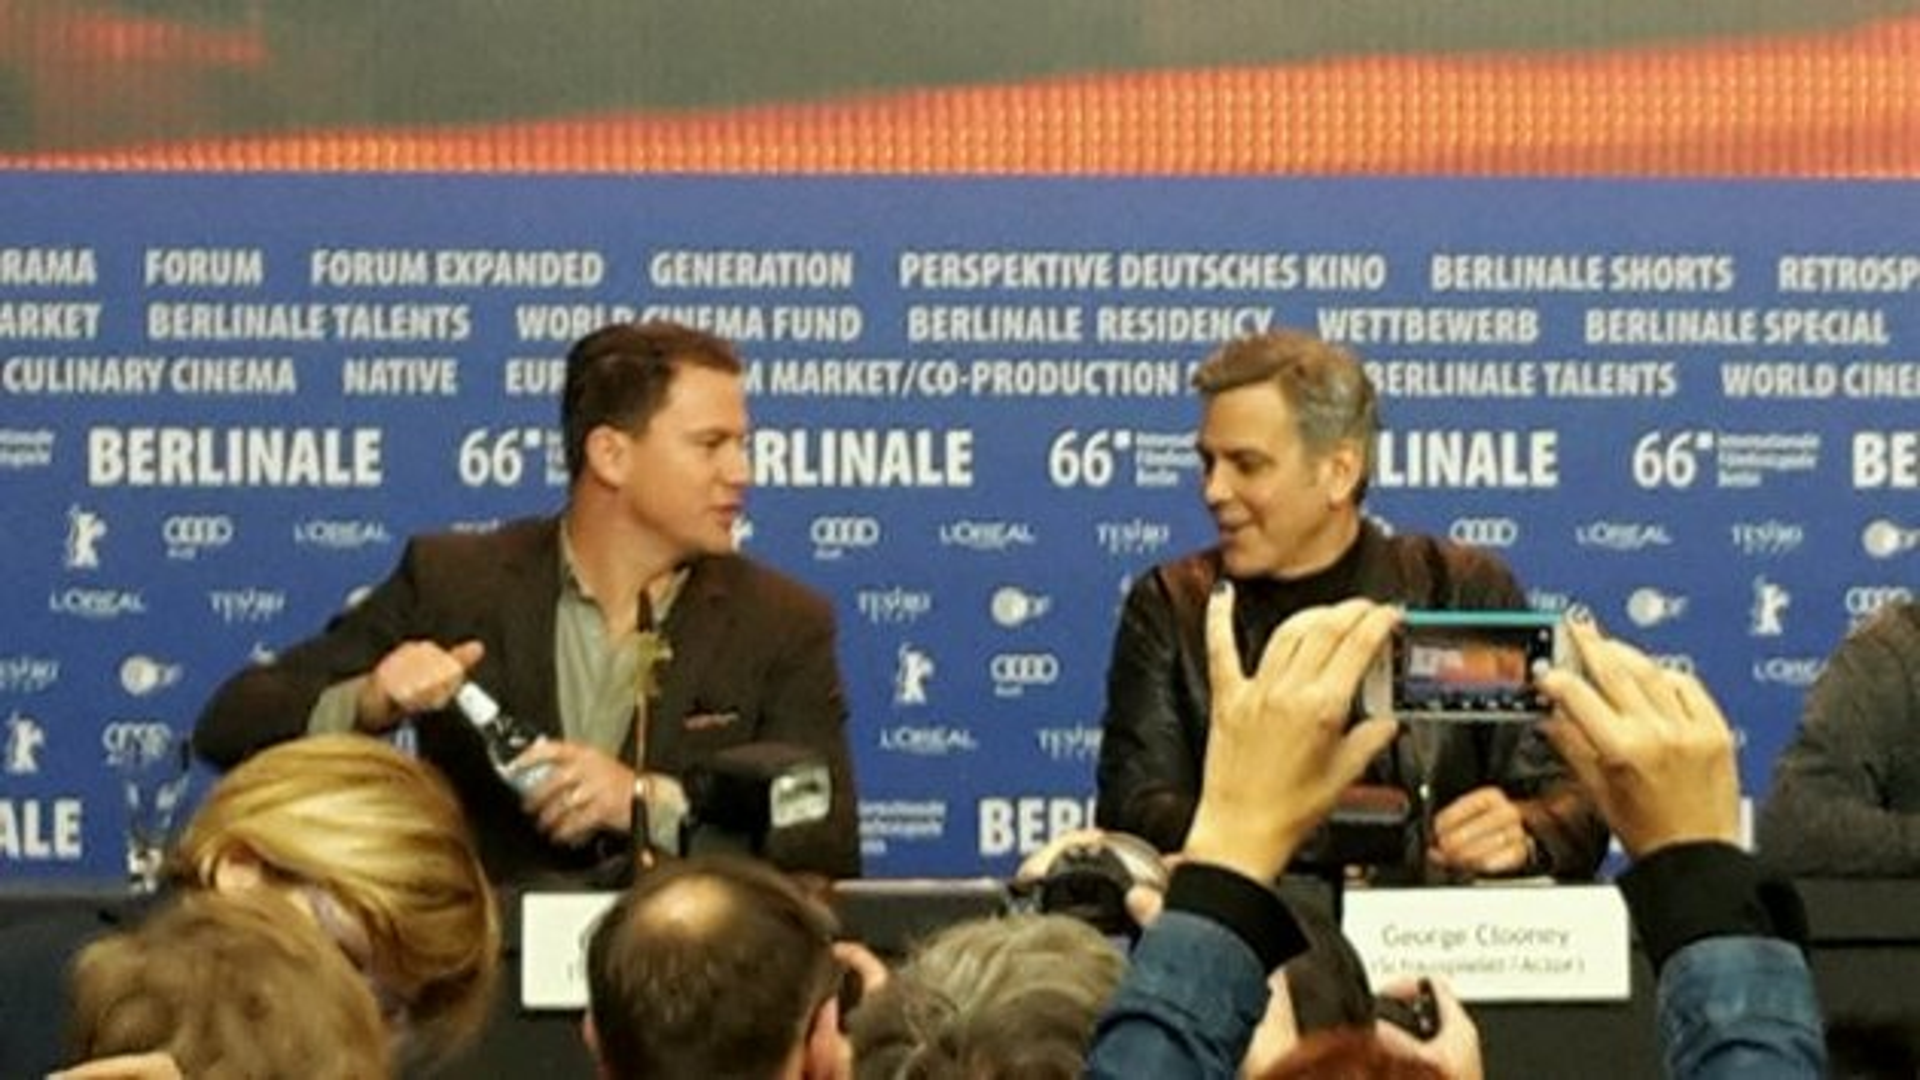 George-Clooney-Channing-Tatum-Berlinale-2016